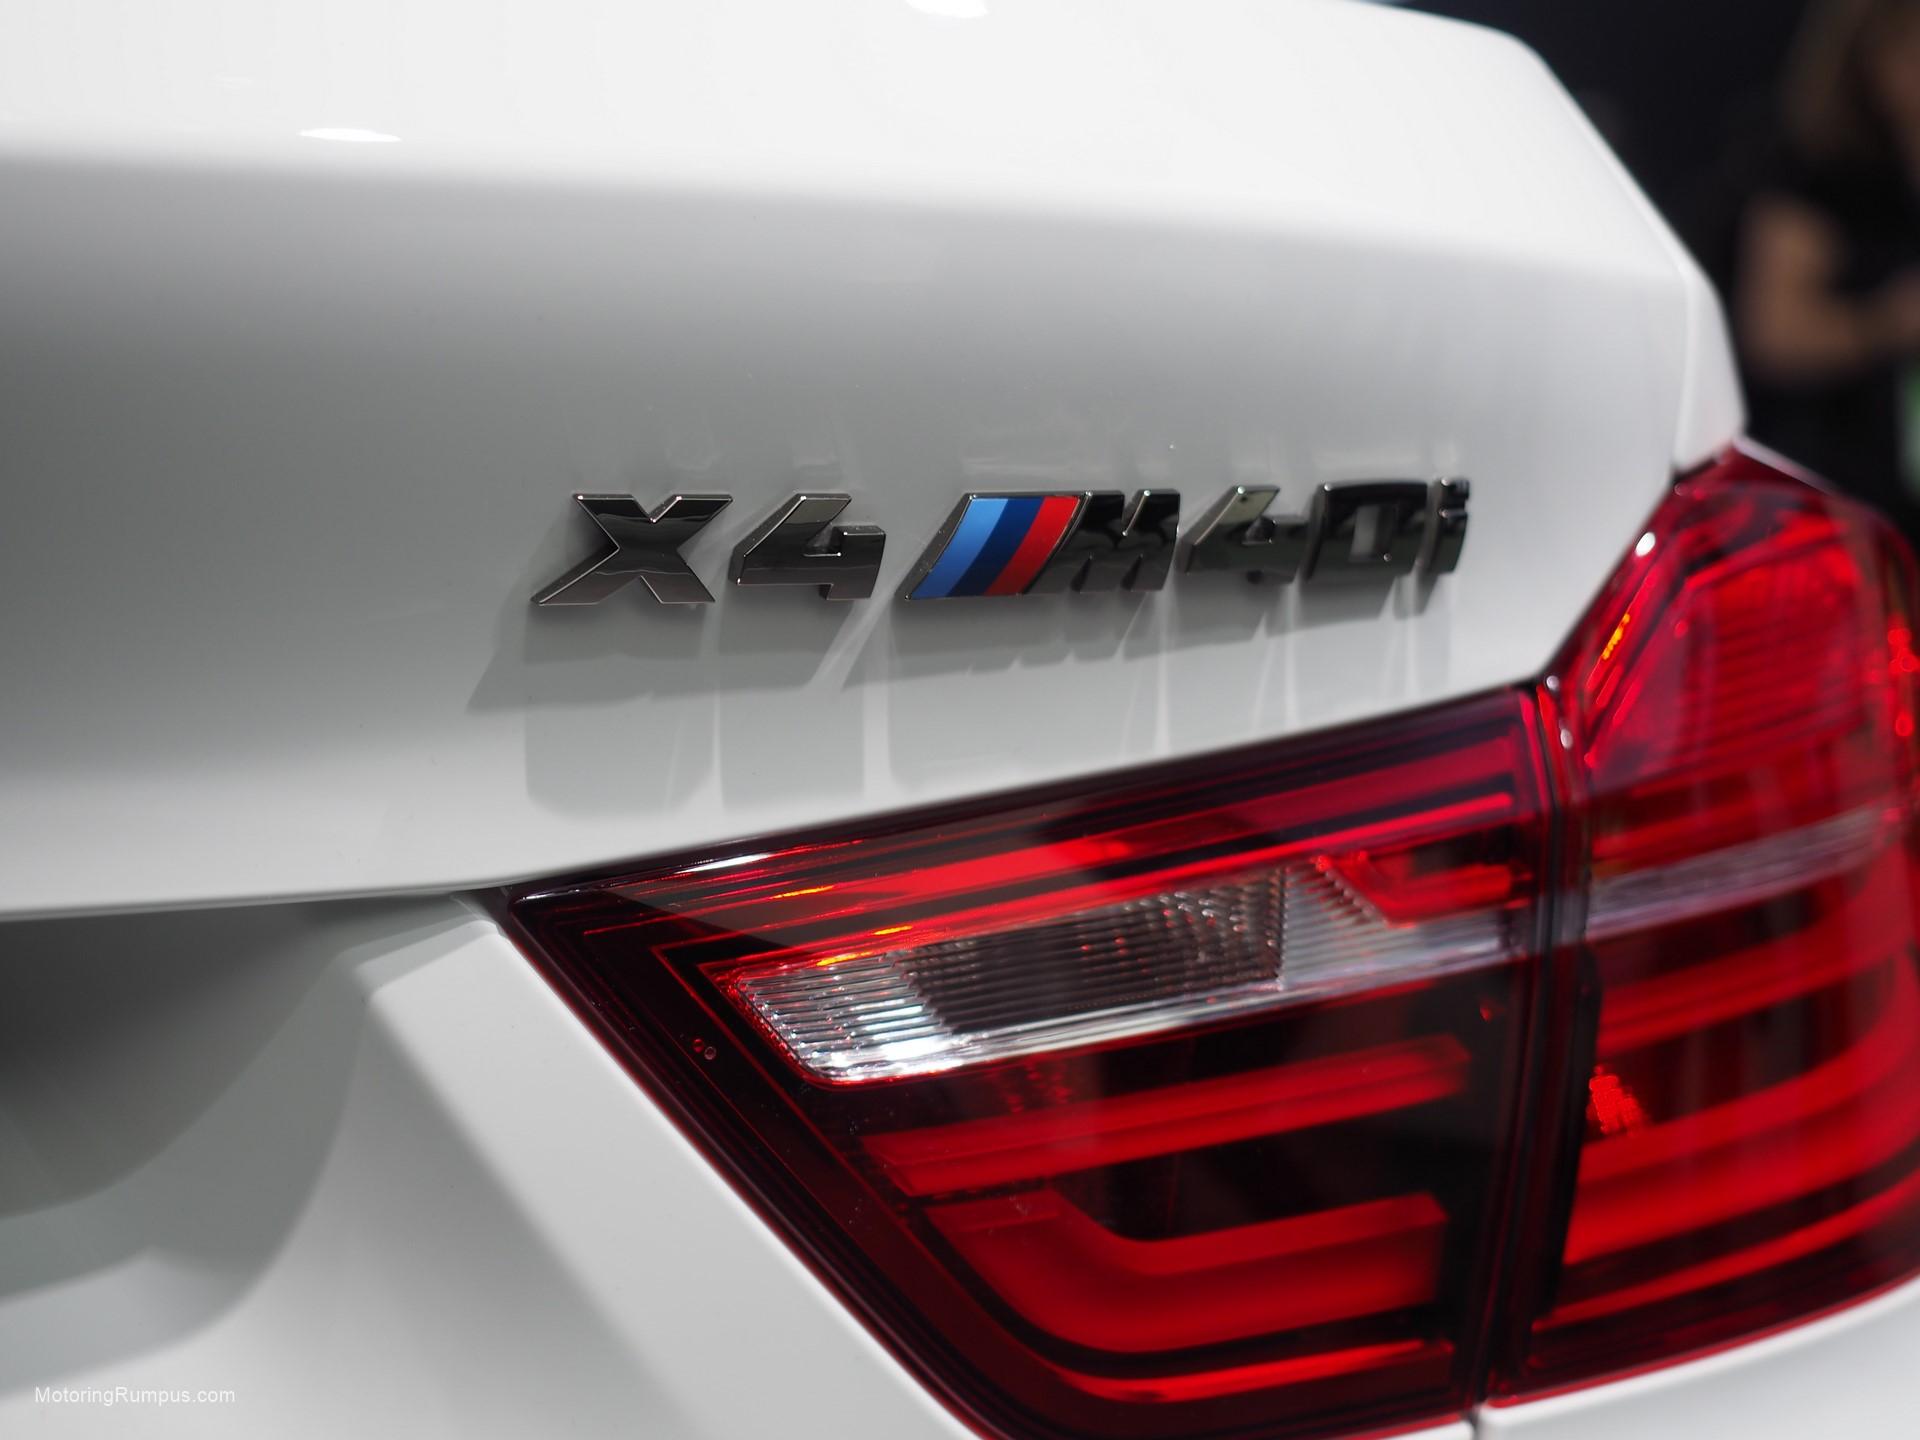 2016 NAIAS BMW X4 M40i Rear Badge